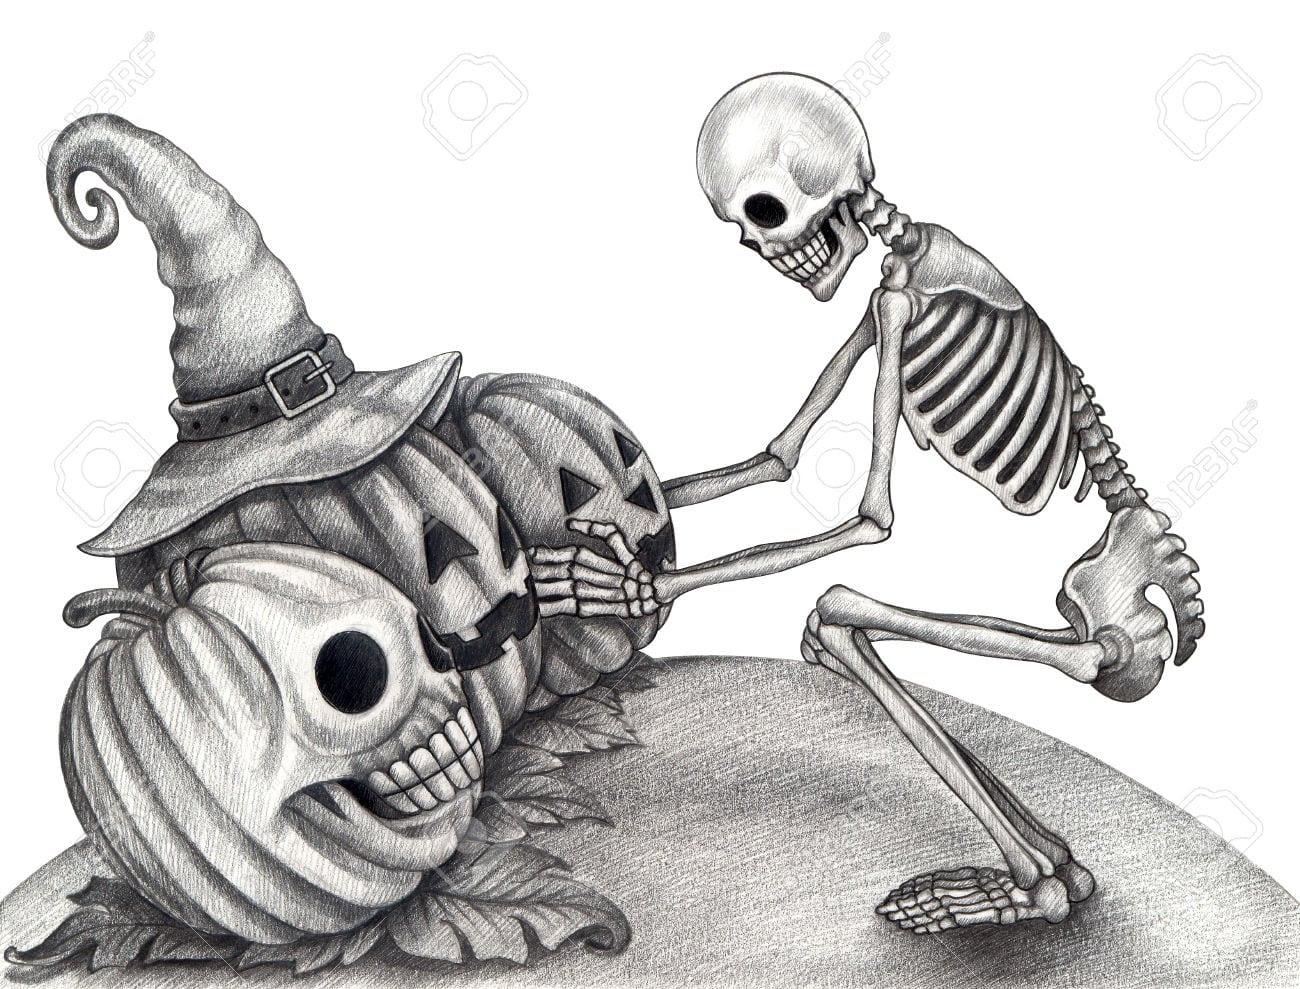 32730552_halloween_skull_pumpkin_tattoo_hand_drawing_on_paper__stock_photo_3